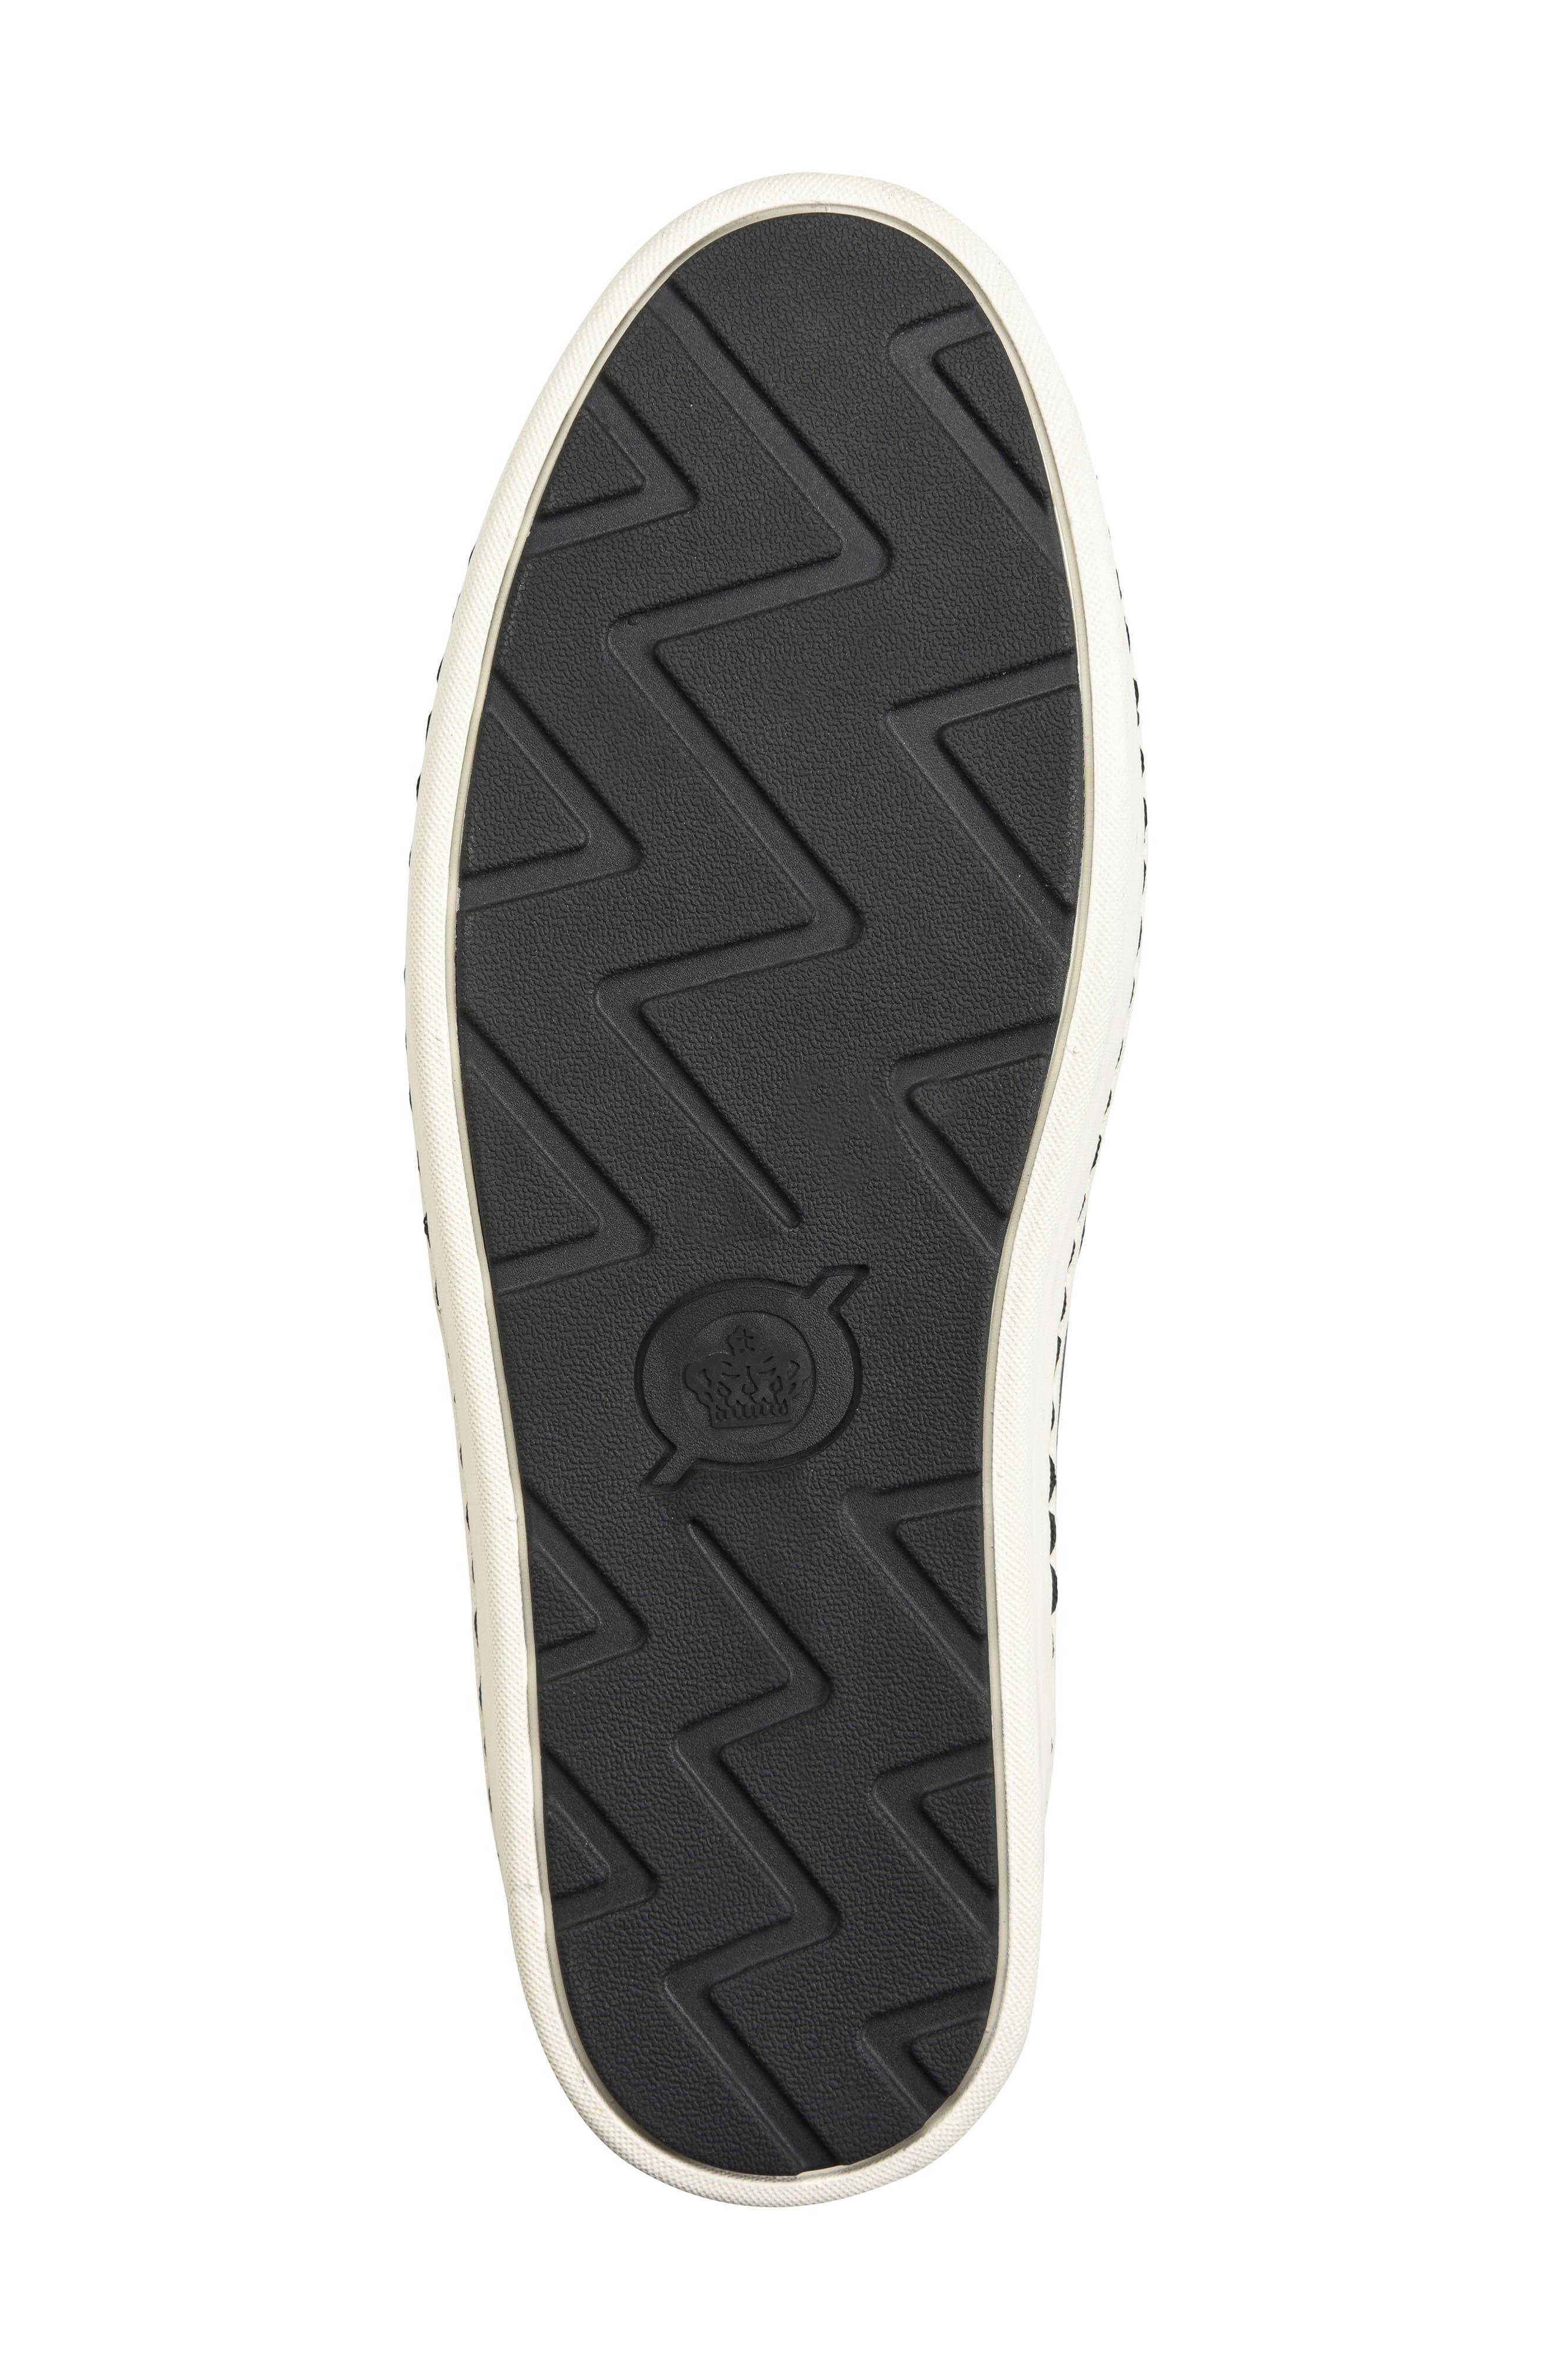 Keystone Low Top Sneaker,                             Alternate thumbnail 6, color,                             001